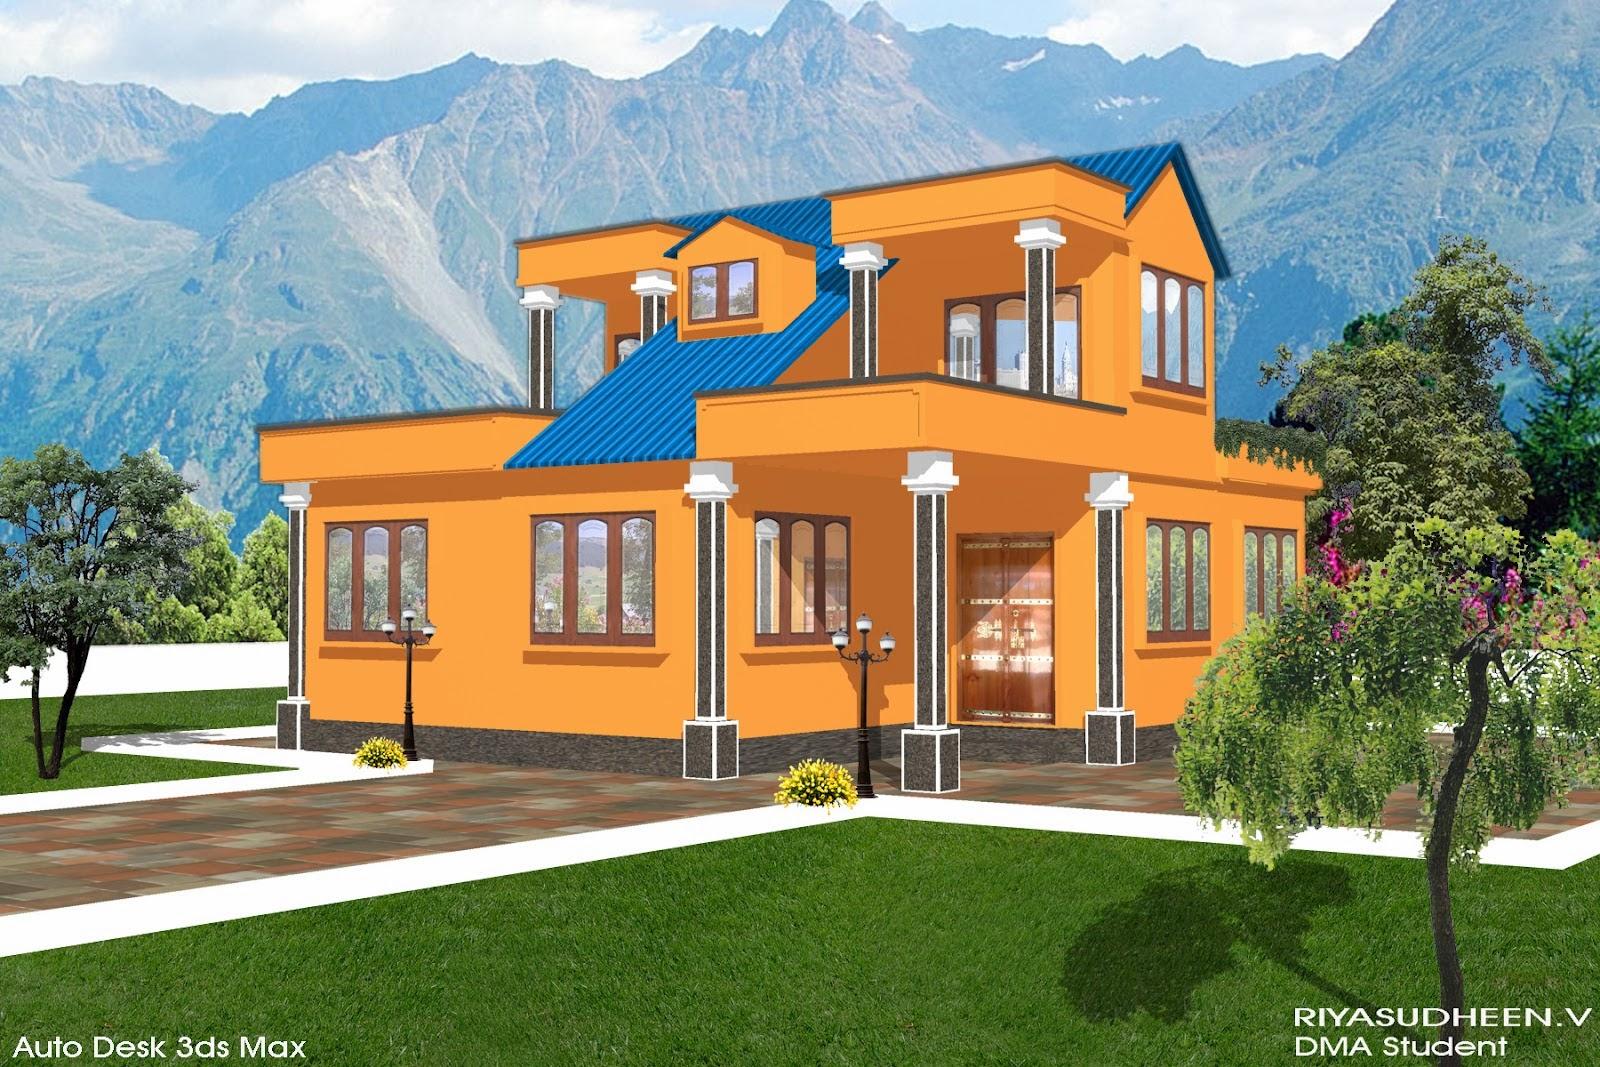 Kerala house 3d design orange used software autodesk 3ds max adobe photoshop year 2011 from g tec computer center melattur